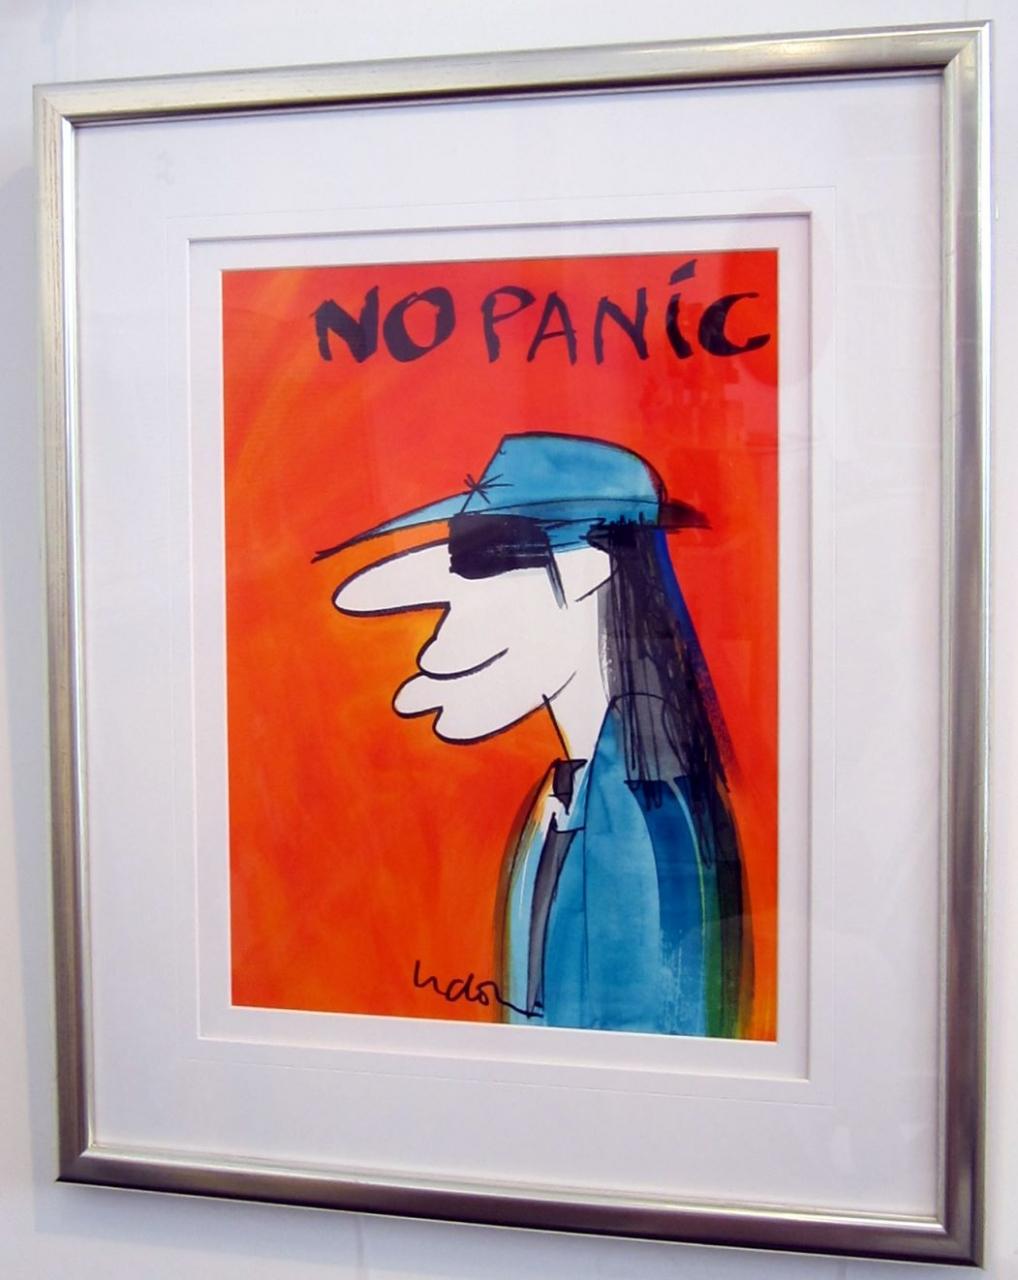 No Panic (Porträt) 2